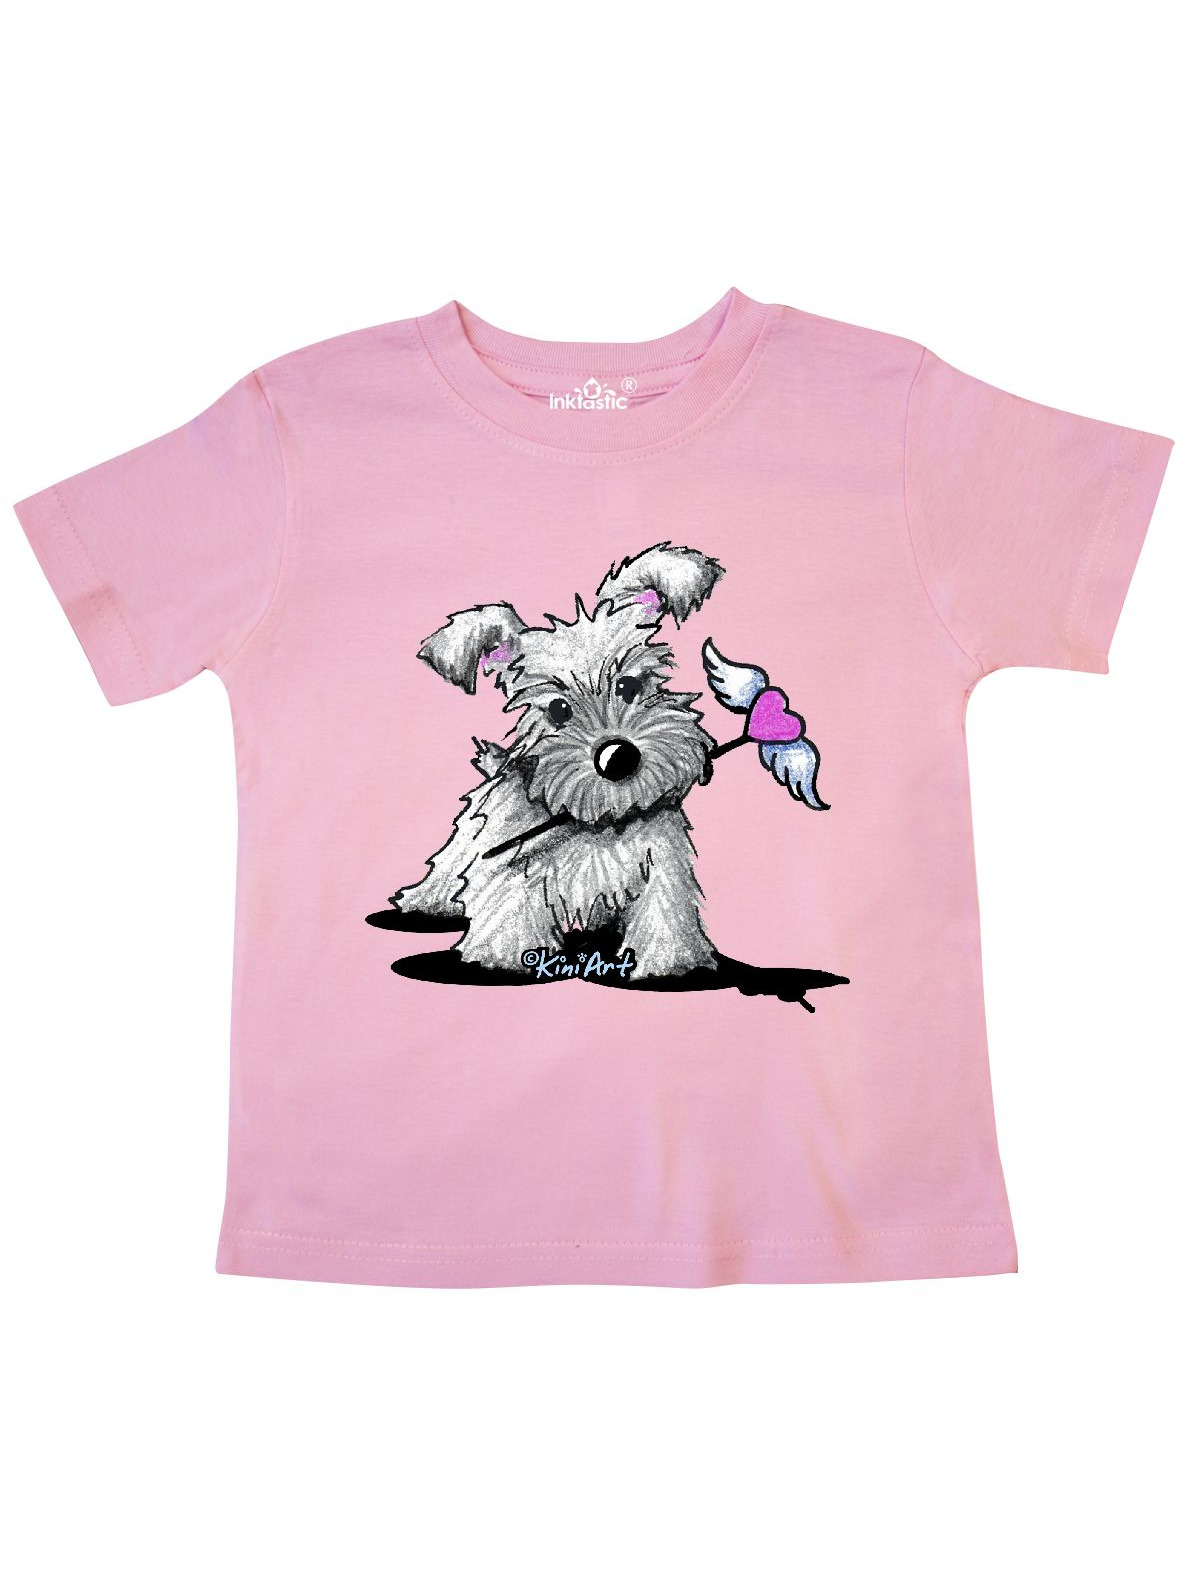 Schnauzer With Heart Toddler T-Shirt - KiniArt